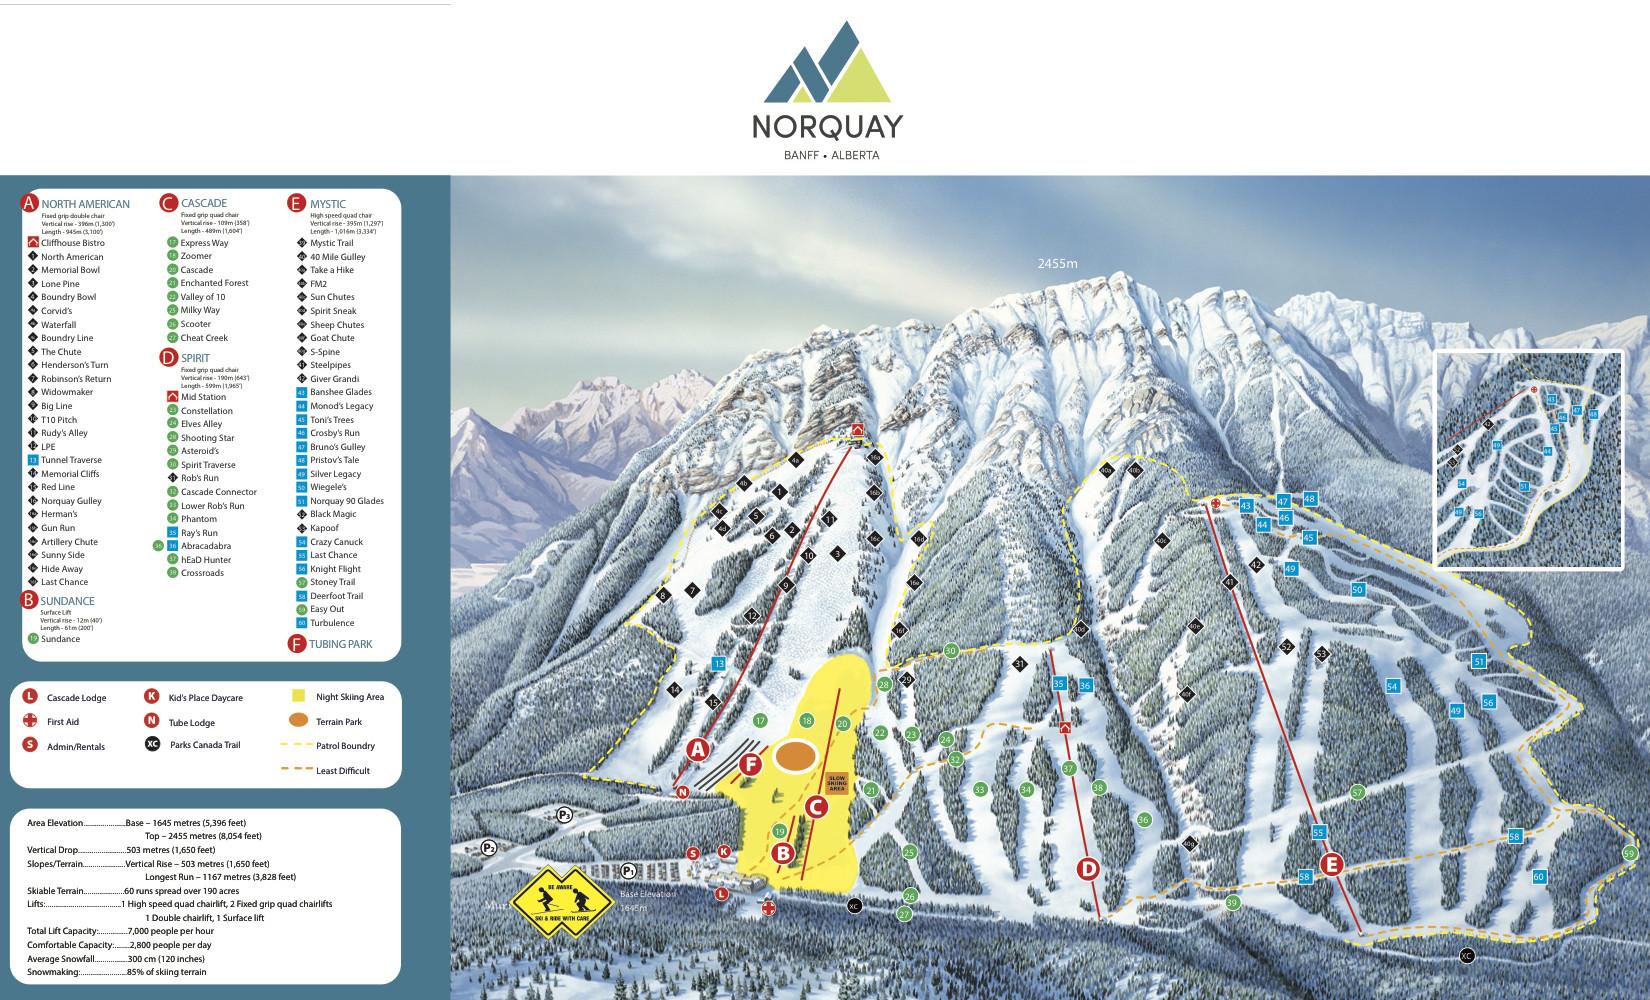 banff mount norquay trail map • piste map • panoramic mountain map